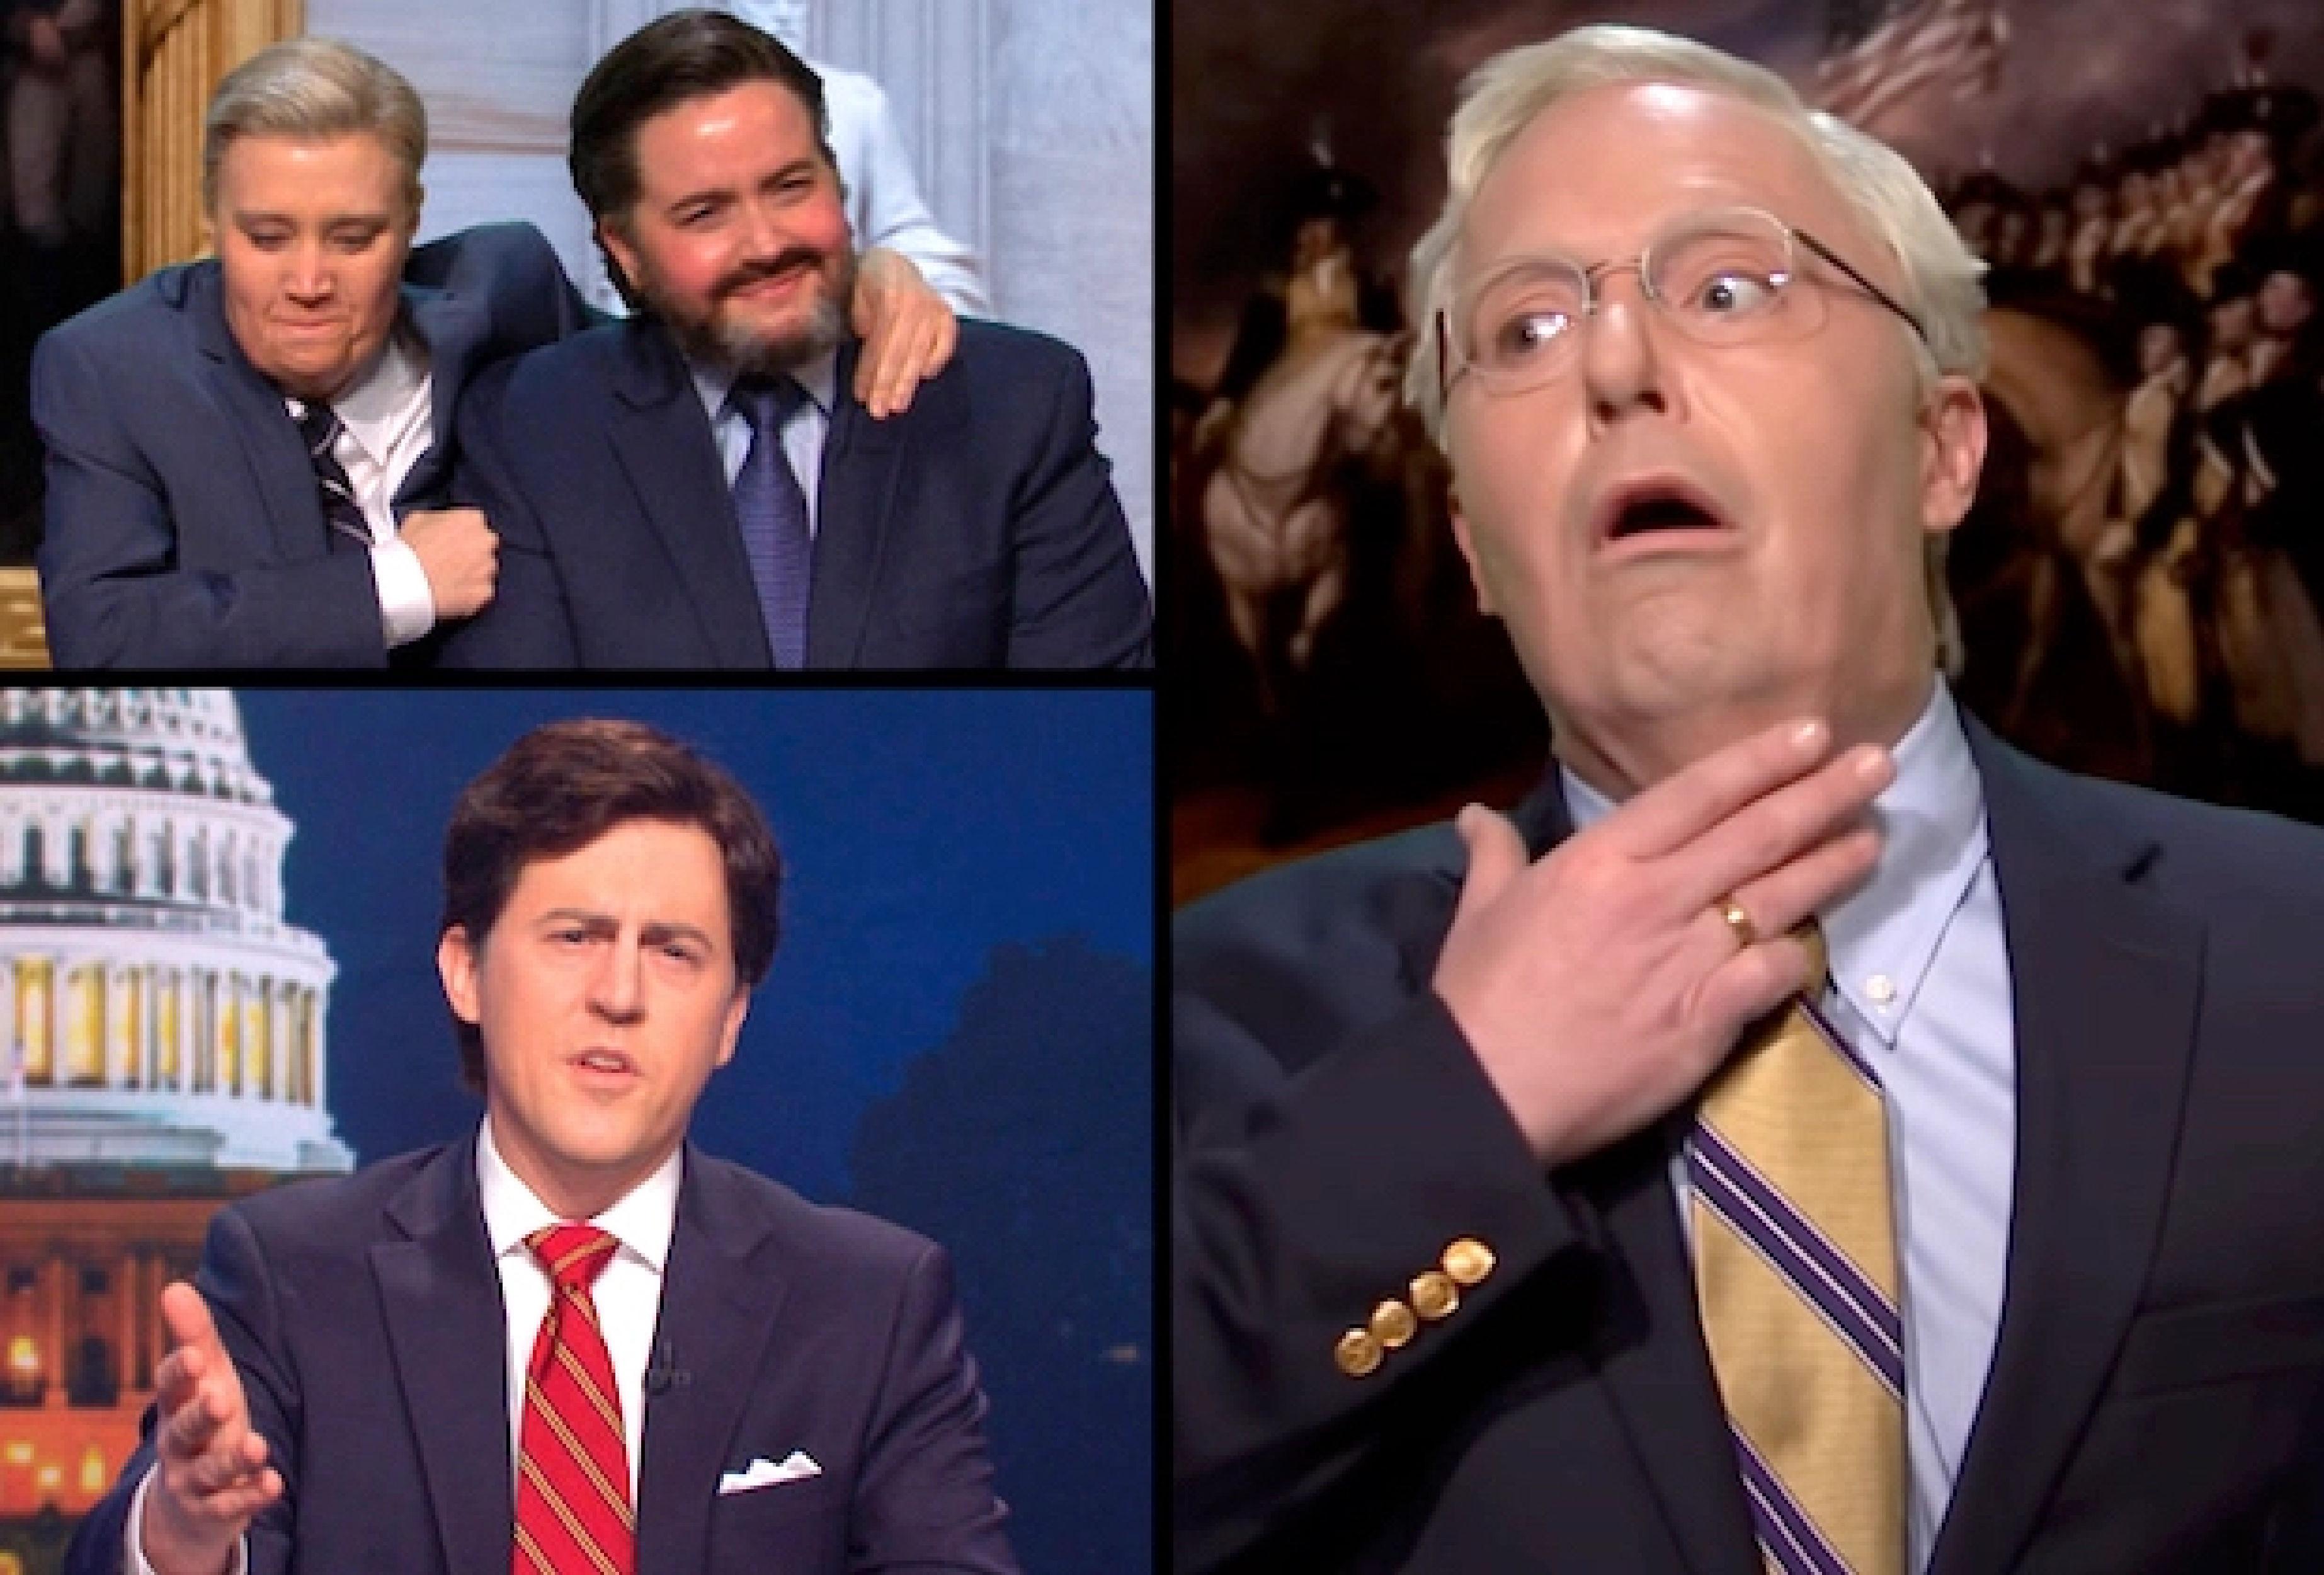 SNL - Has It Peaked?